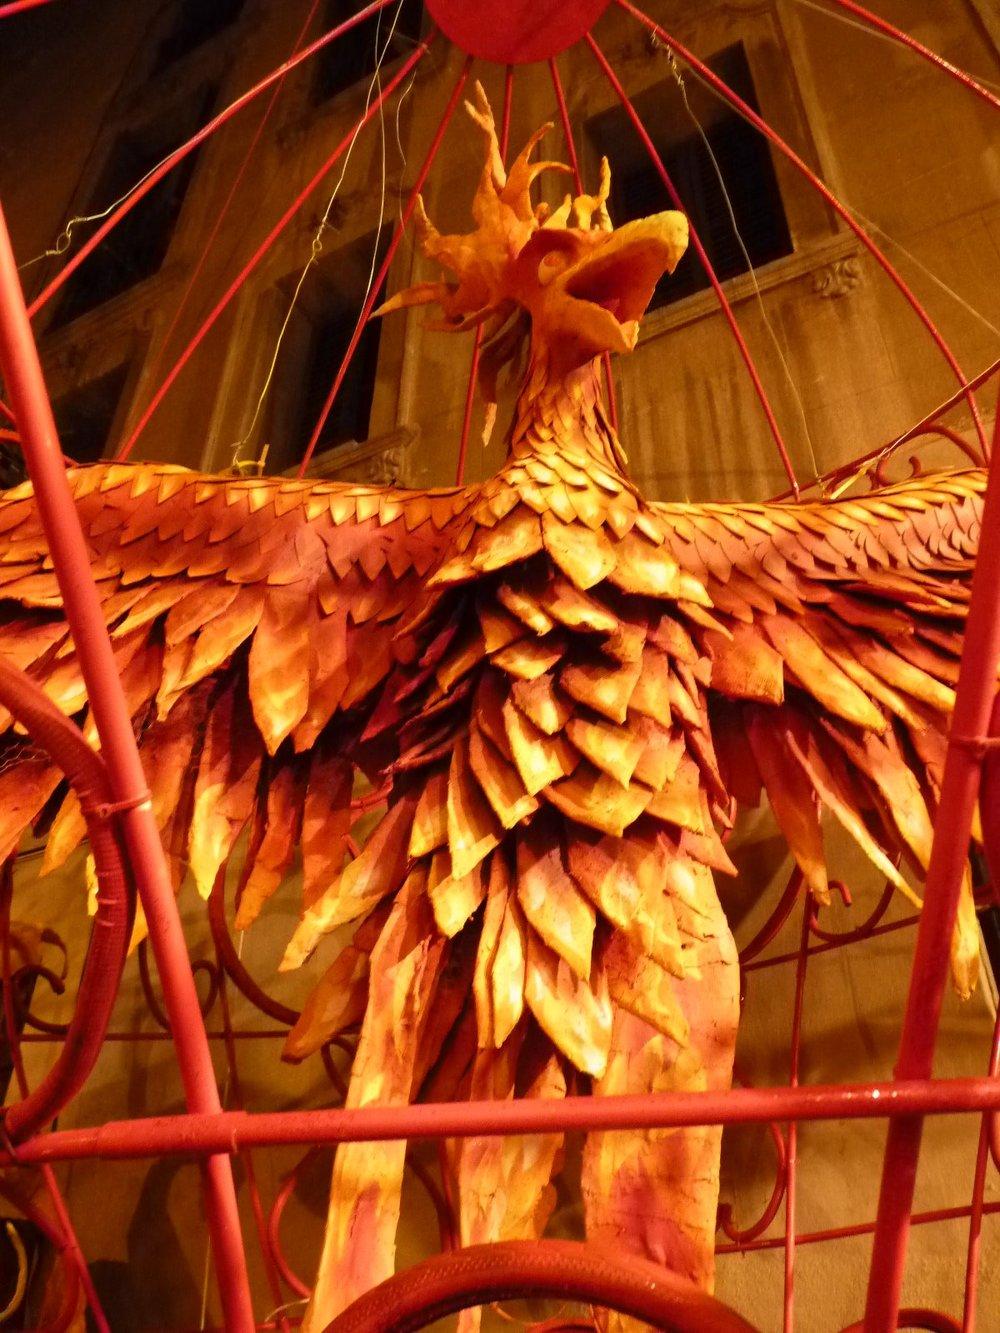 Festival-Gracia-Street-Sculpture-e1377425693549.jpg